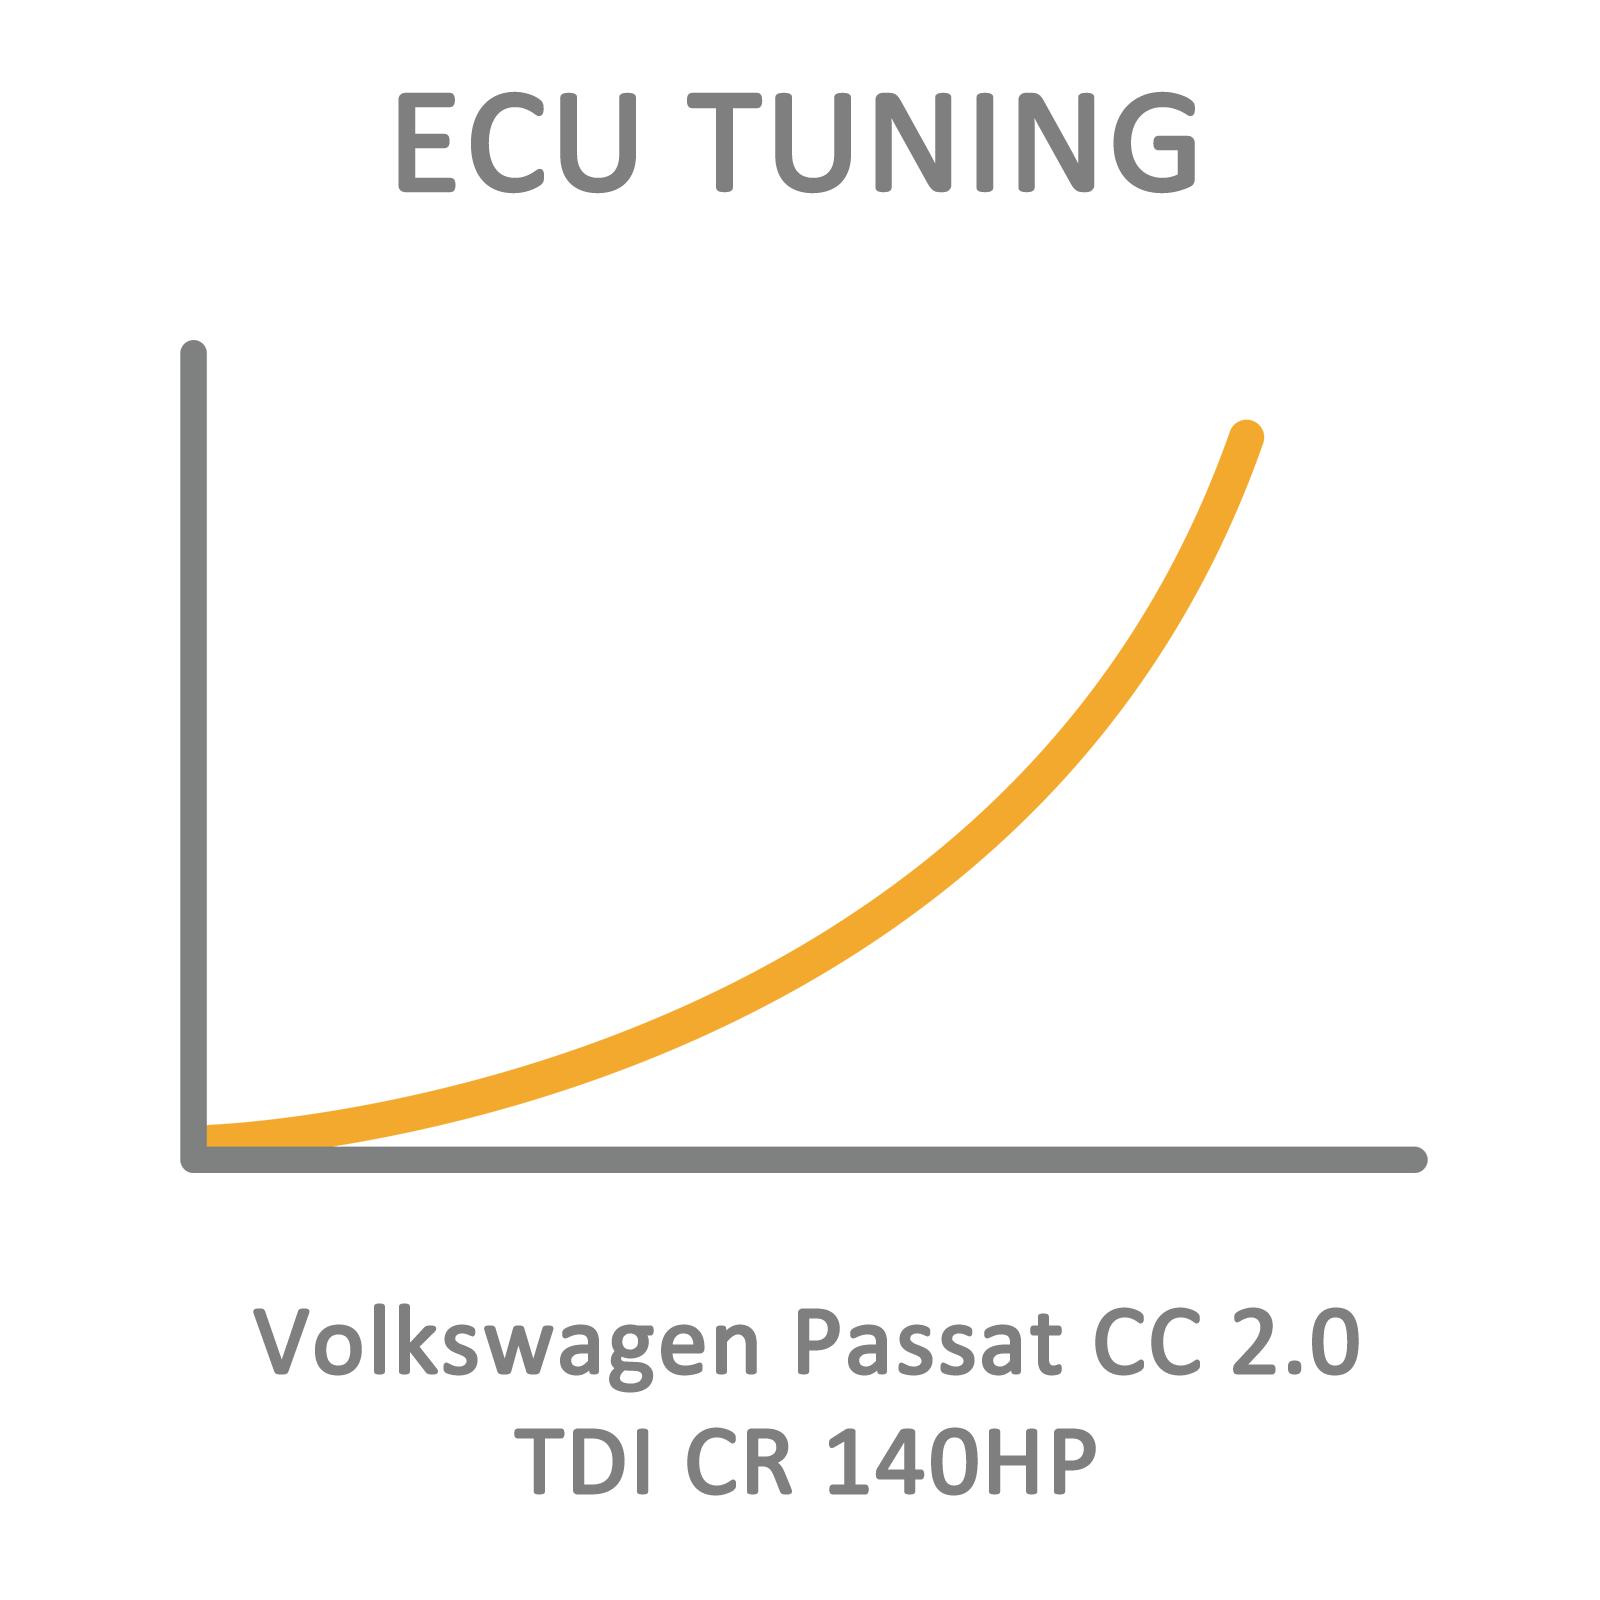 Volkswagen Passat CC 2.0 TDI CR 140HP ECU Tuning Remapping